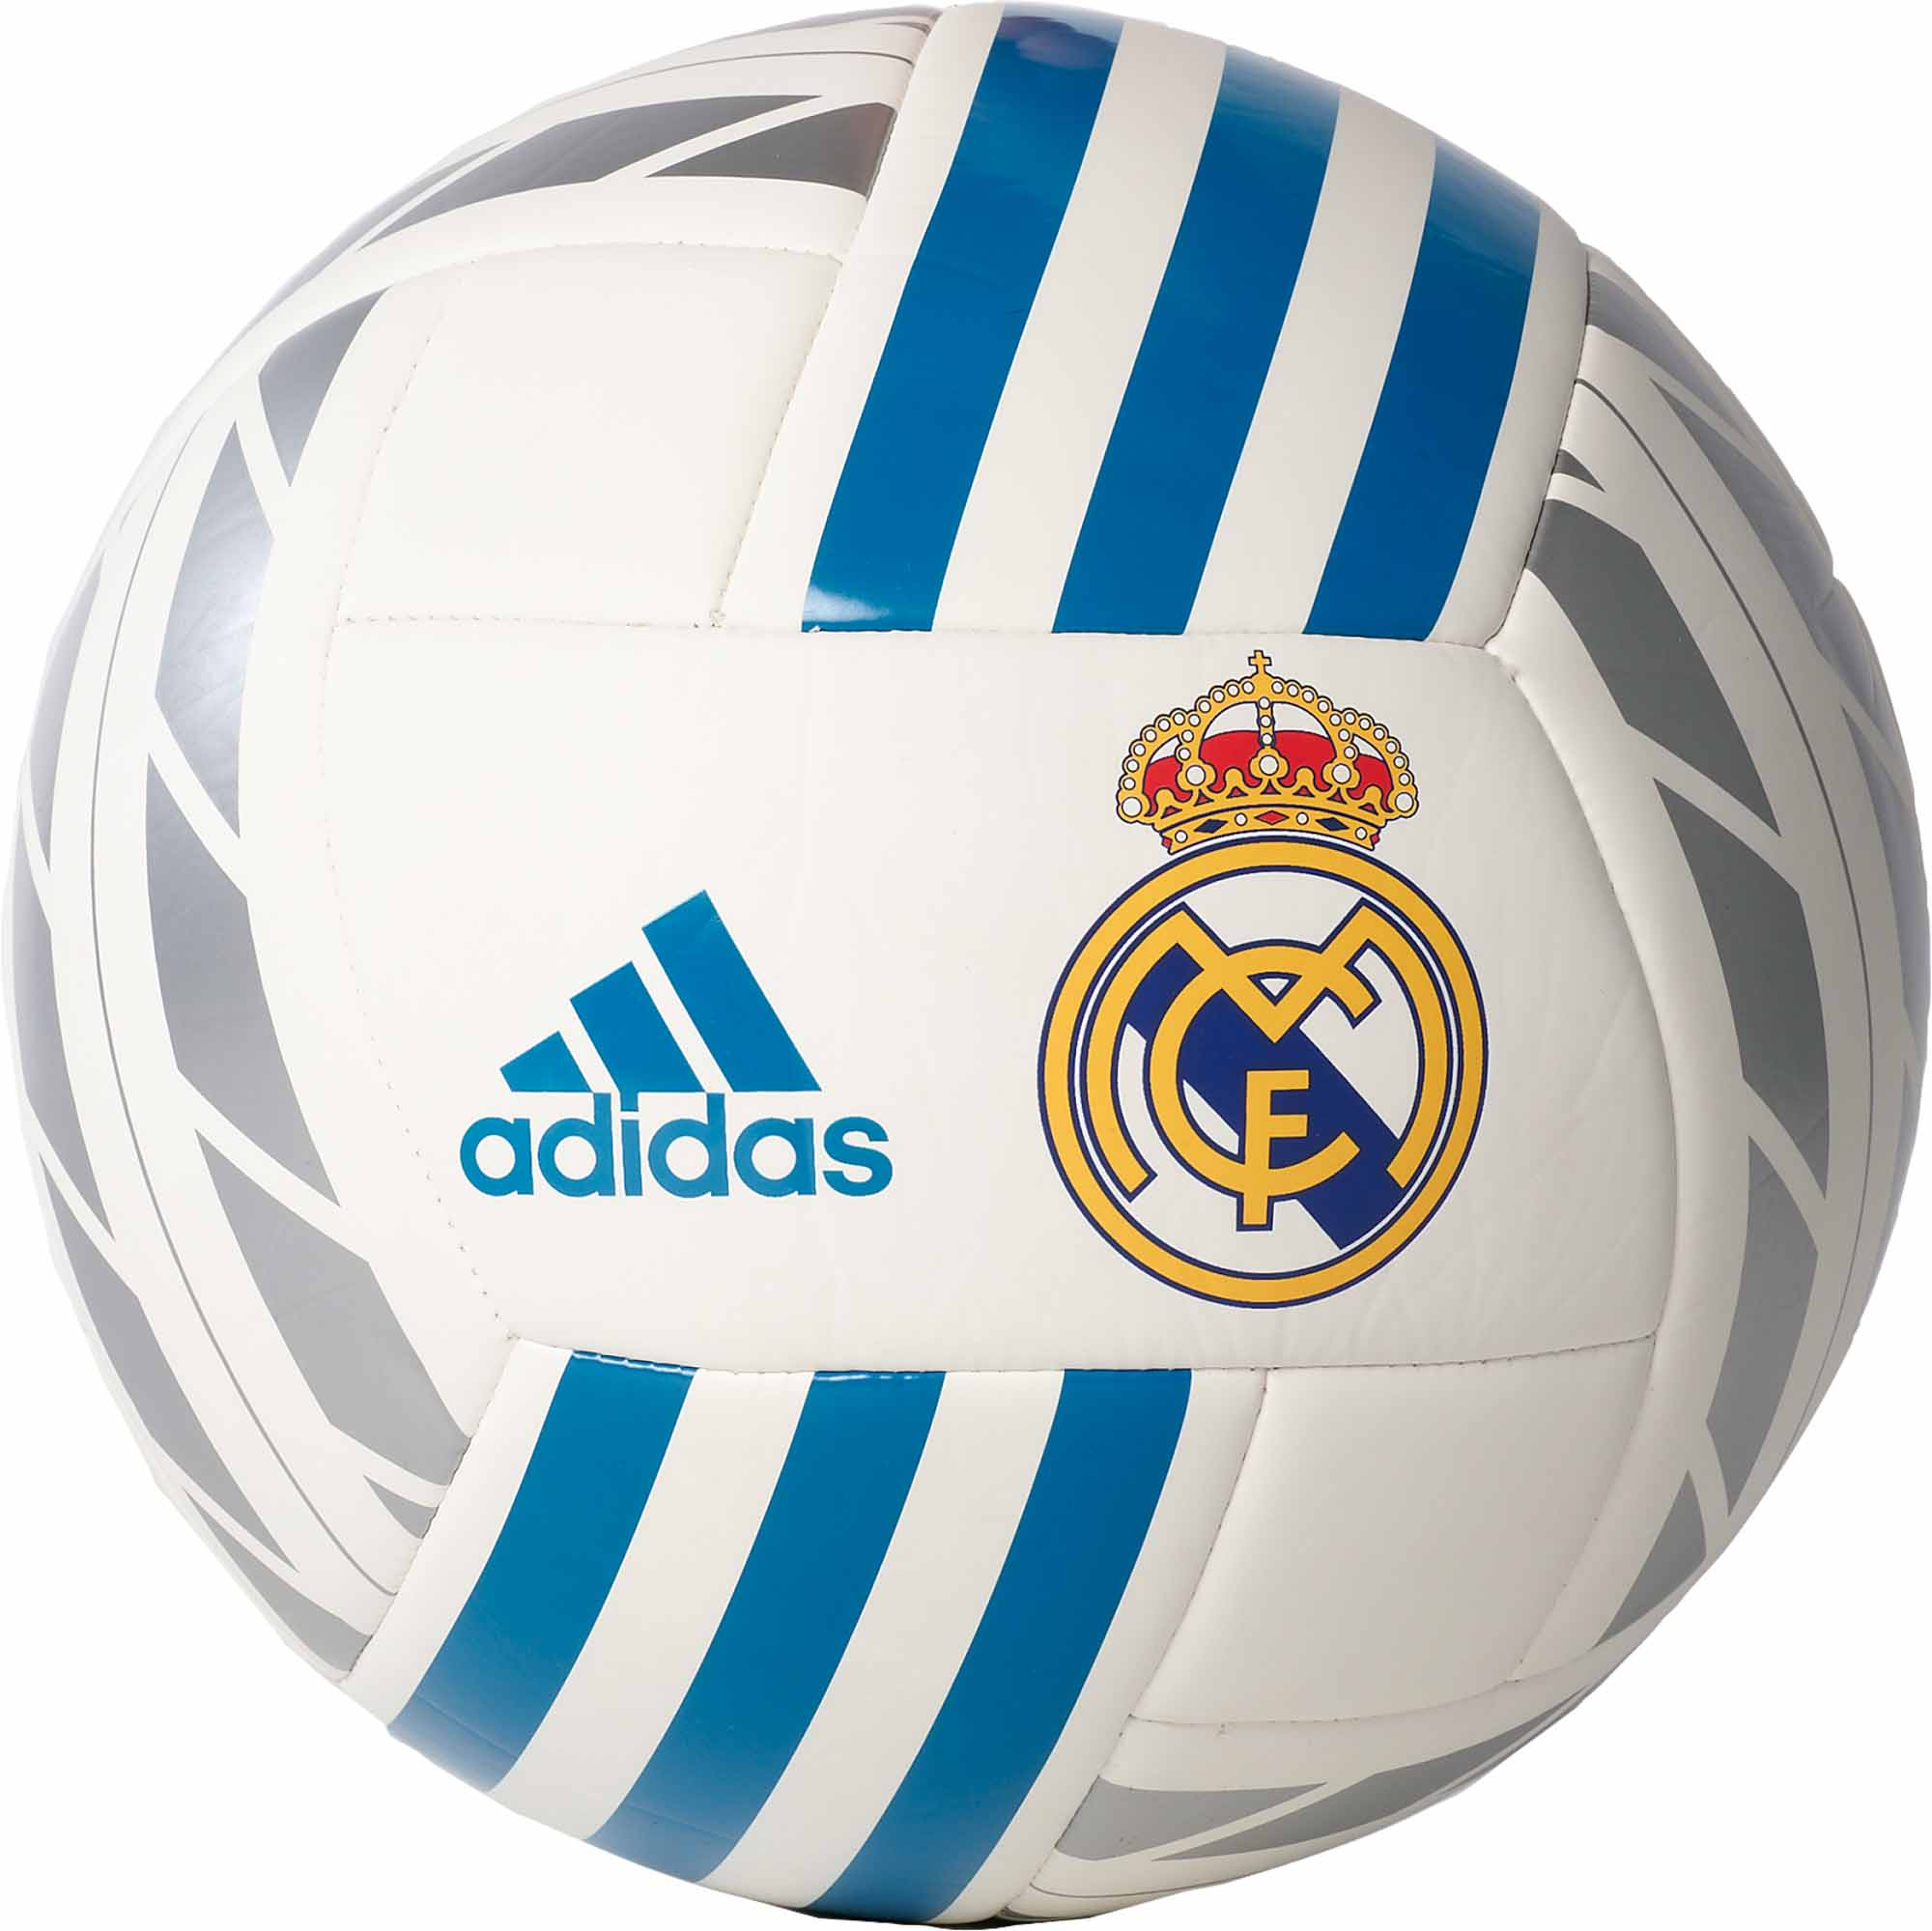 bq1397_adidas_realmadrid_ball_01.jpg